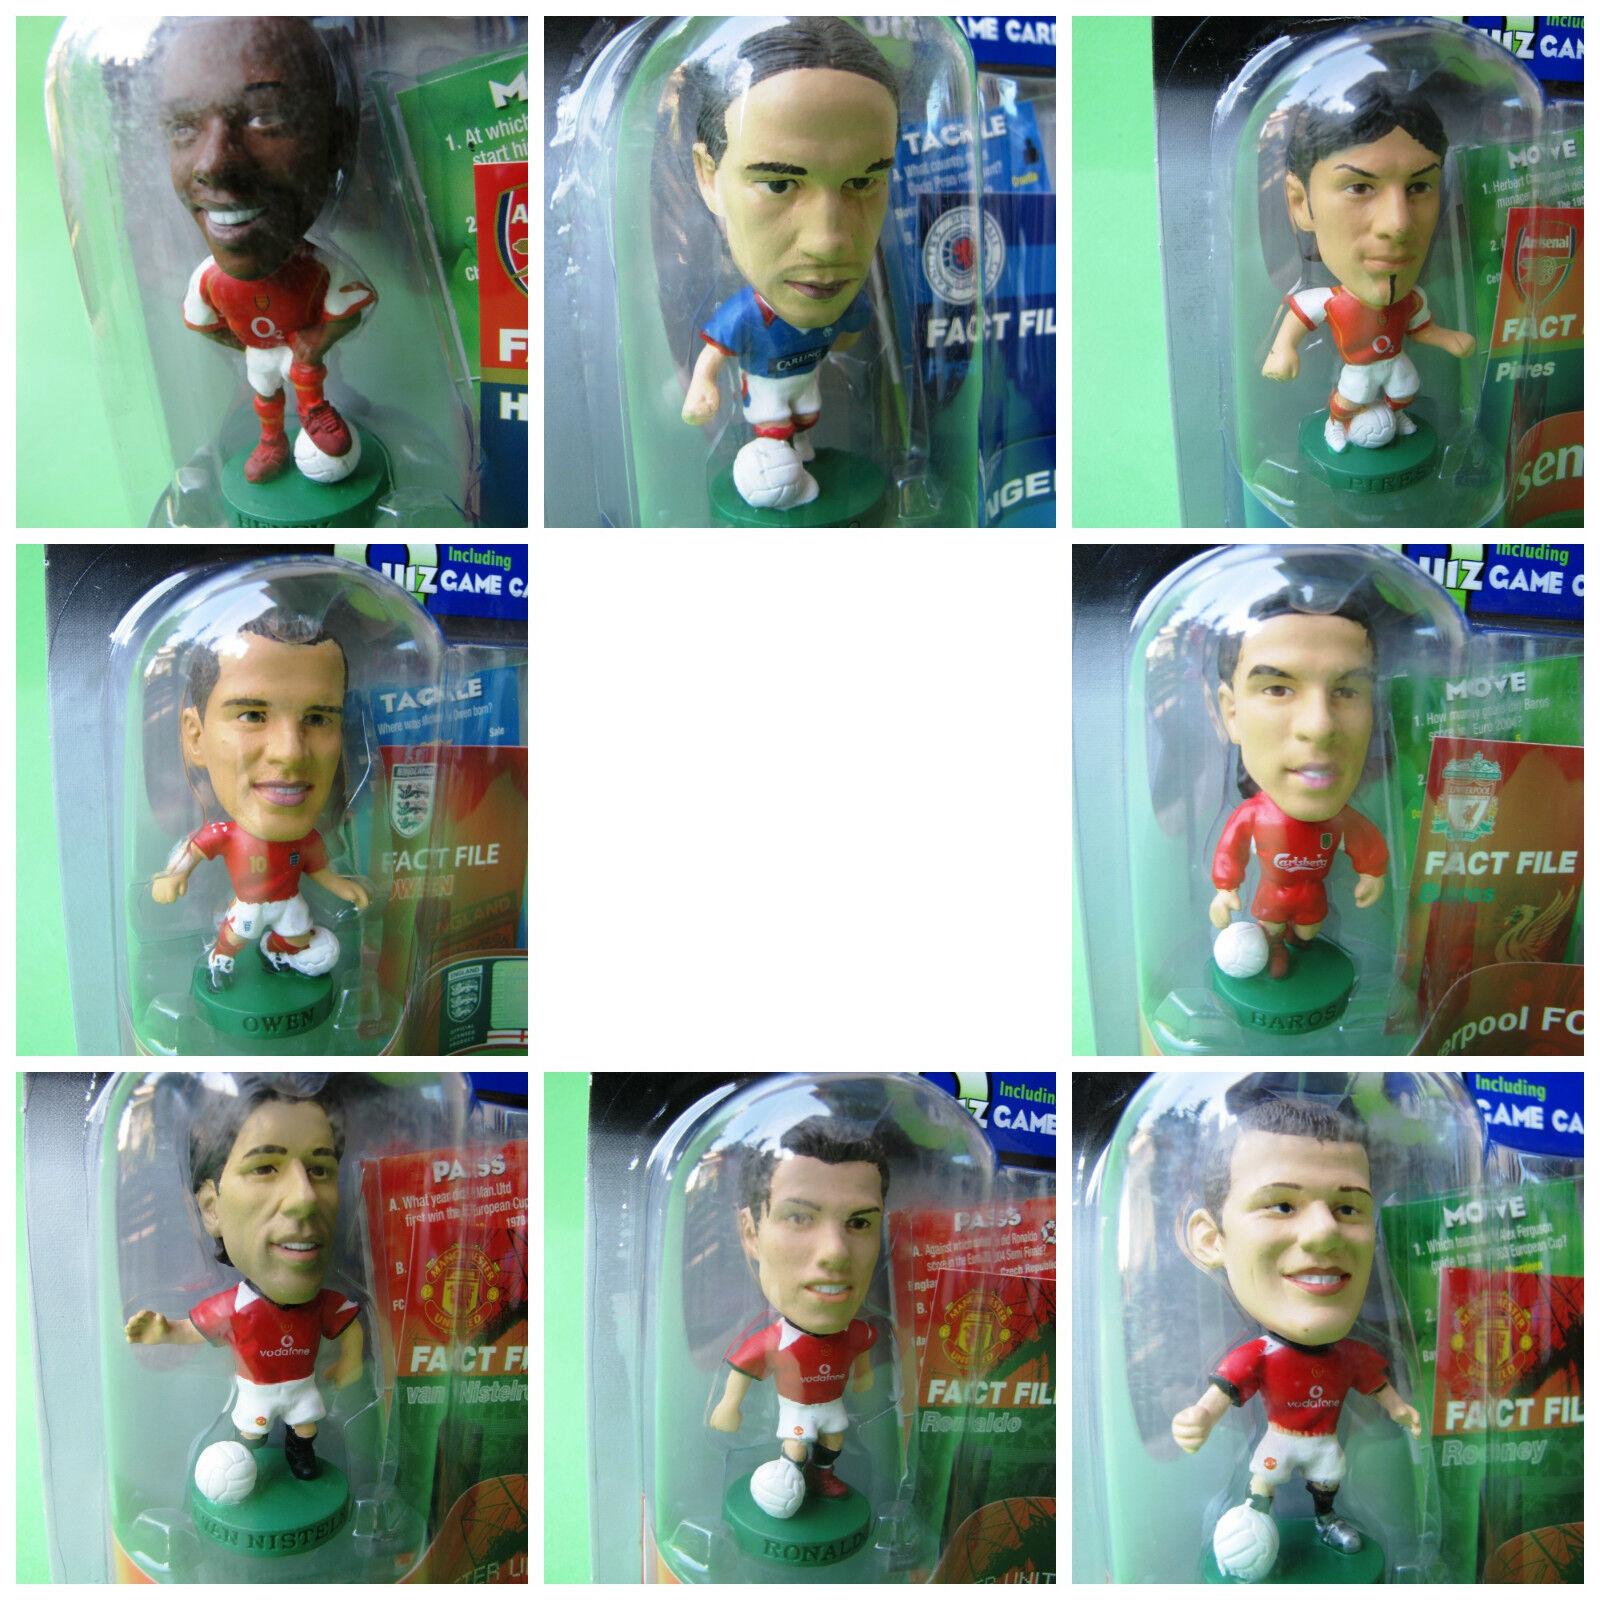 Lot of 7 ProStars Prso Henry Baros Rooney Pires Owen Ronaldo Nistelrooy Football